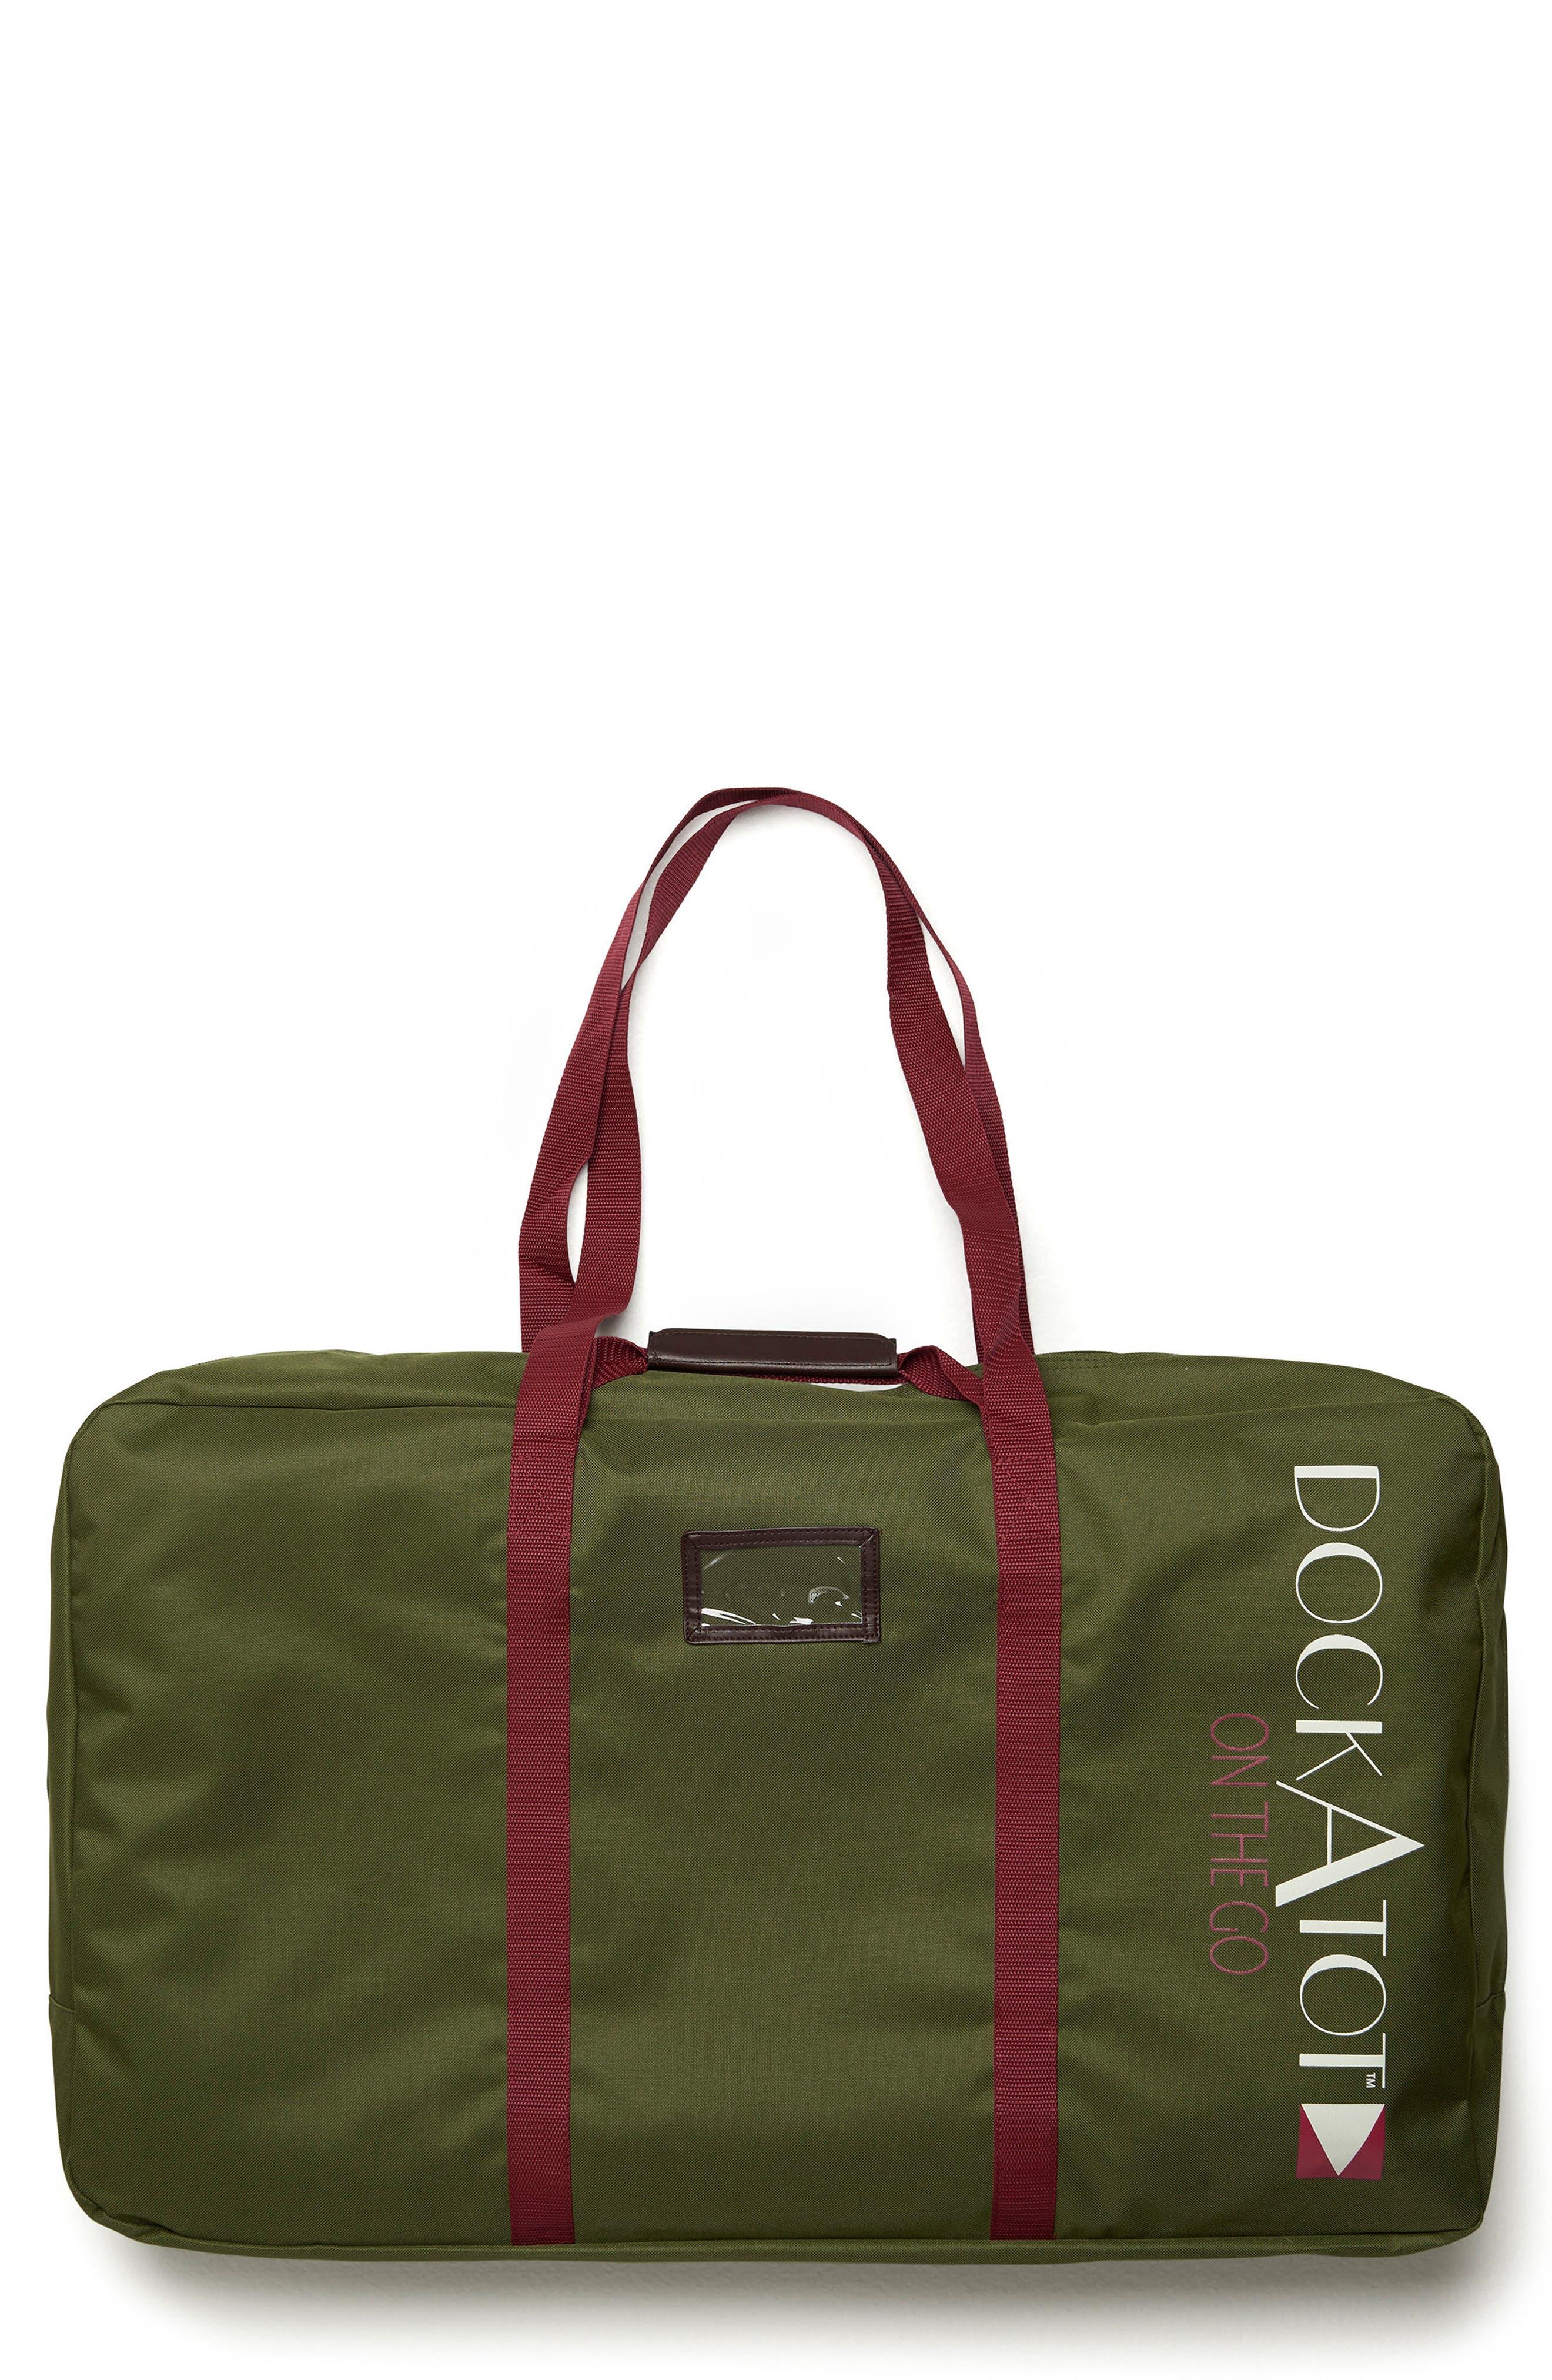 Alternate Image 1 Selected - DockATot Deluxe Transport Bag